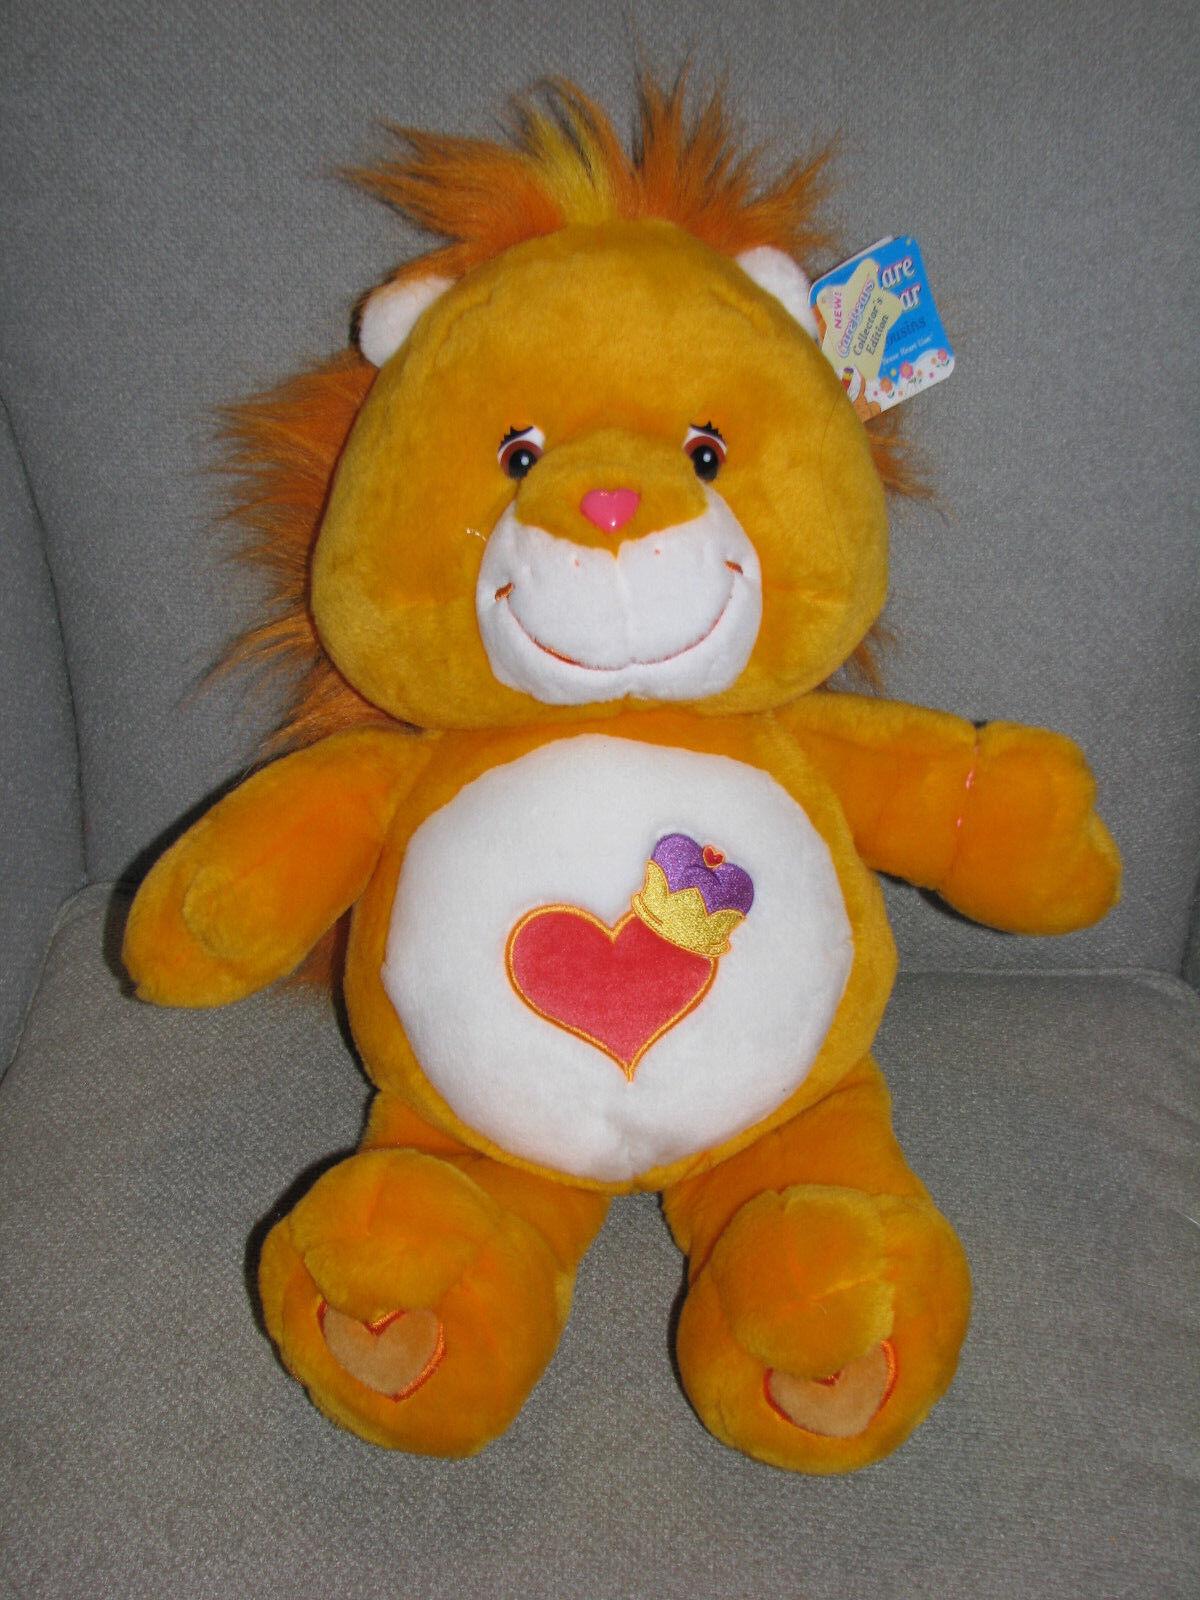 2004 PLAY Alungo TCFC STUFFED PLUSH autoEorso autoE orso COUSIN BRAVE HEART LION 20